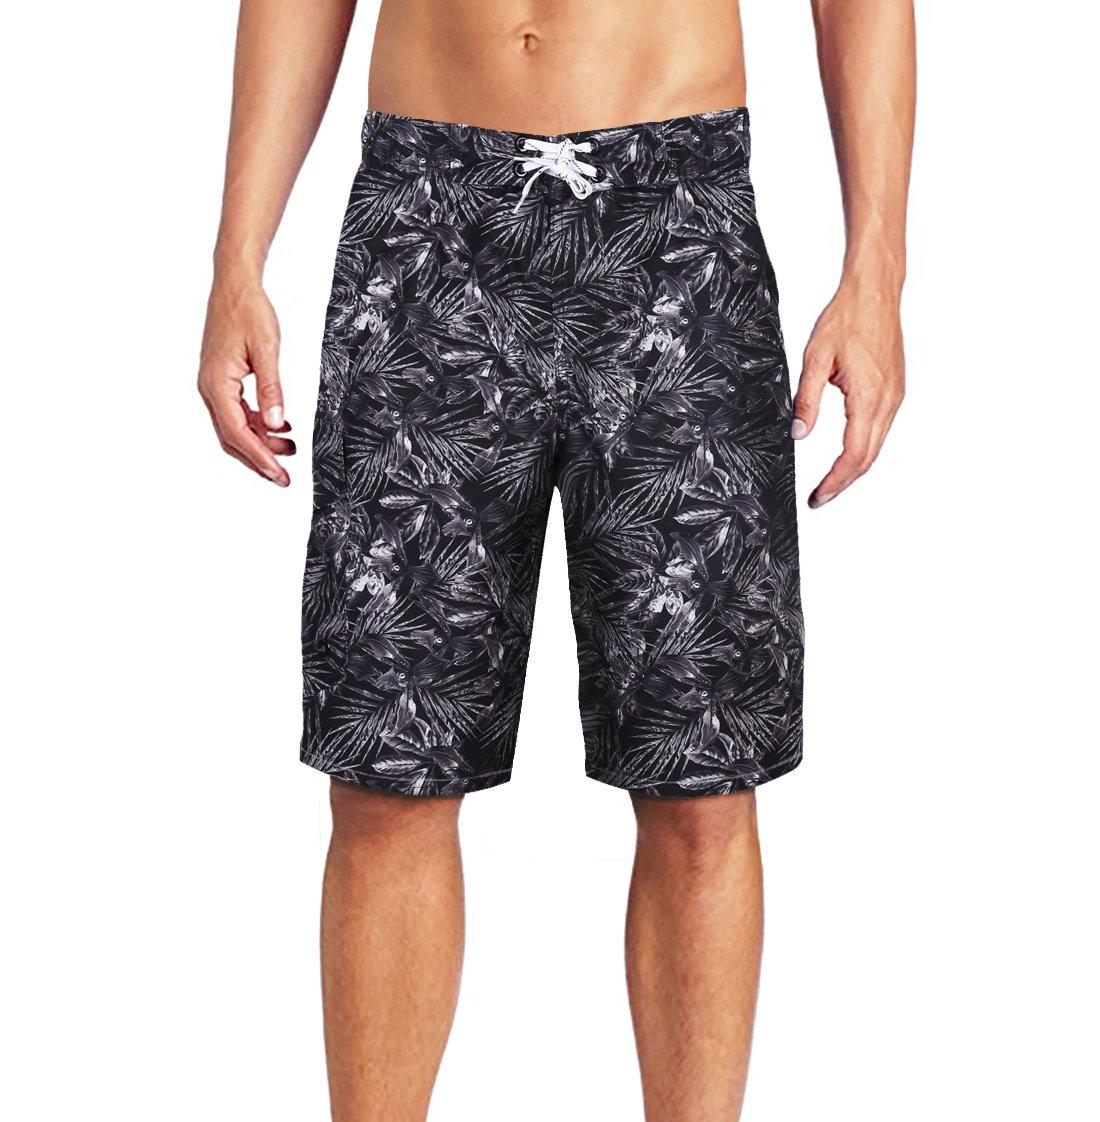 Men's Swim Trunks Quick Dry with Meshlining and Cargo Pocket Leaf Print Black XL